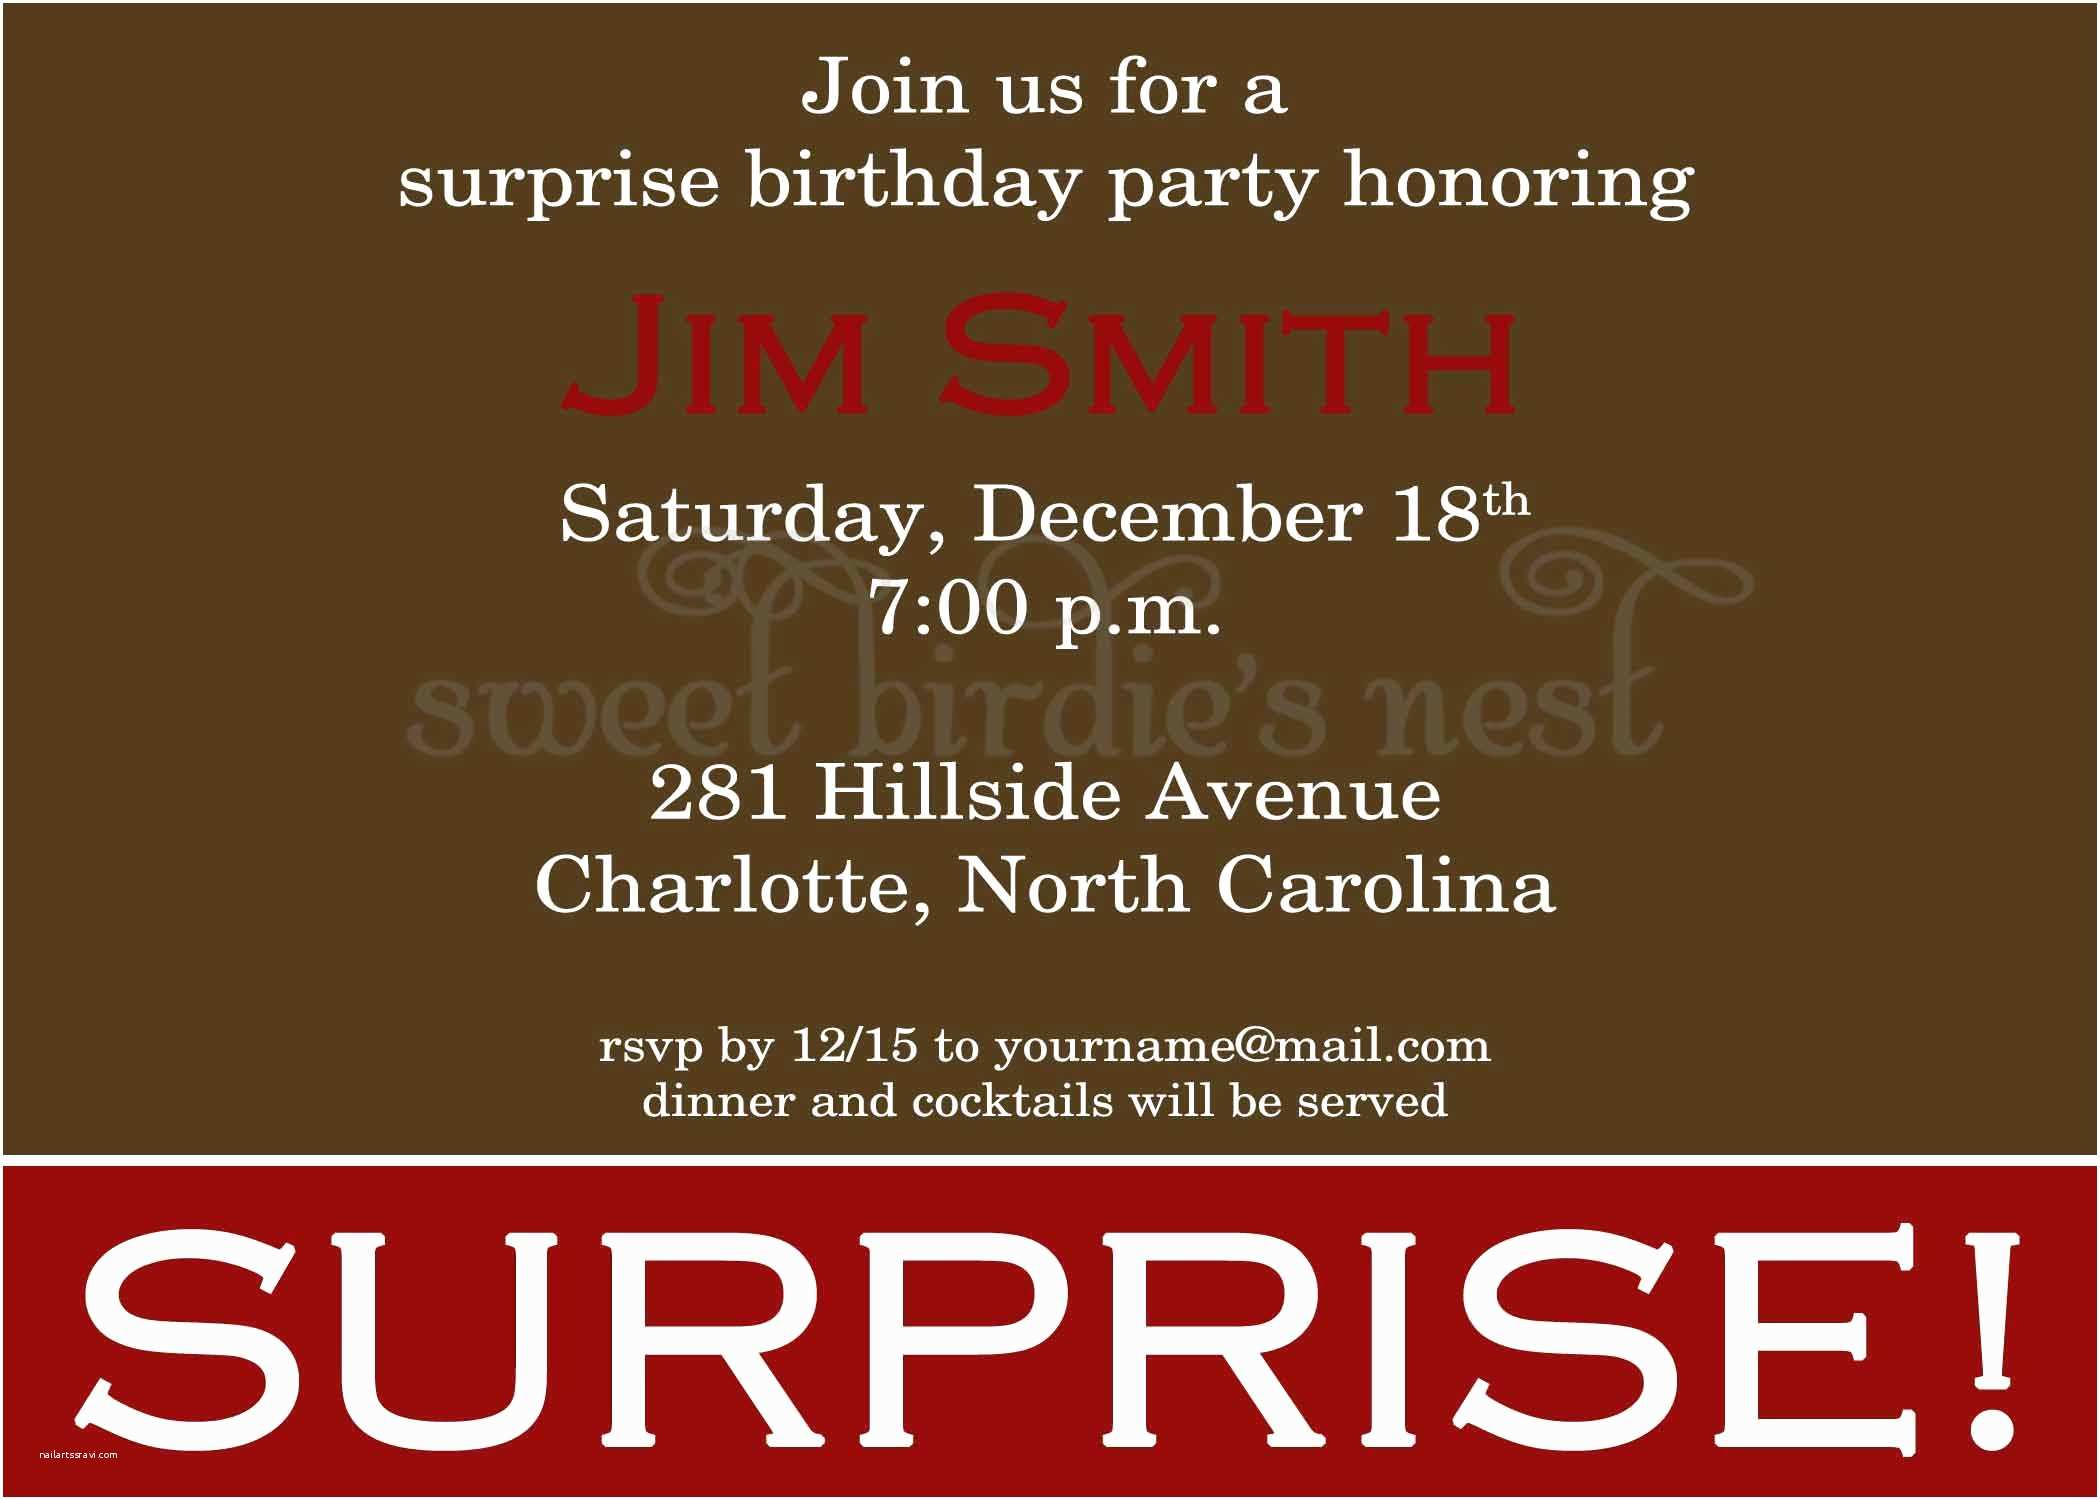 Surprise Party Invitation Template Surprise Party Invitation